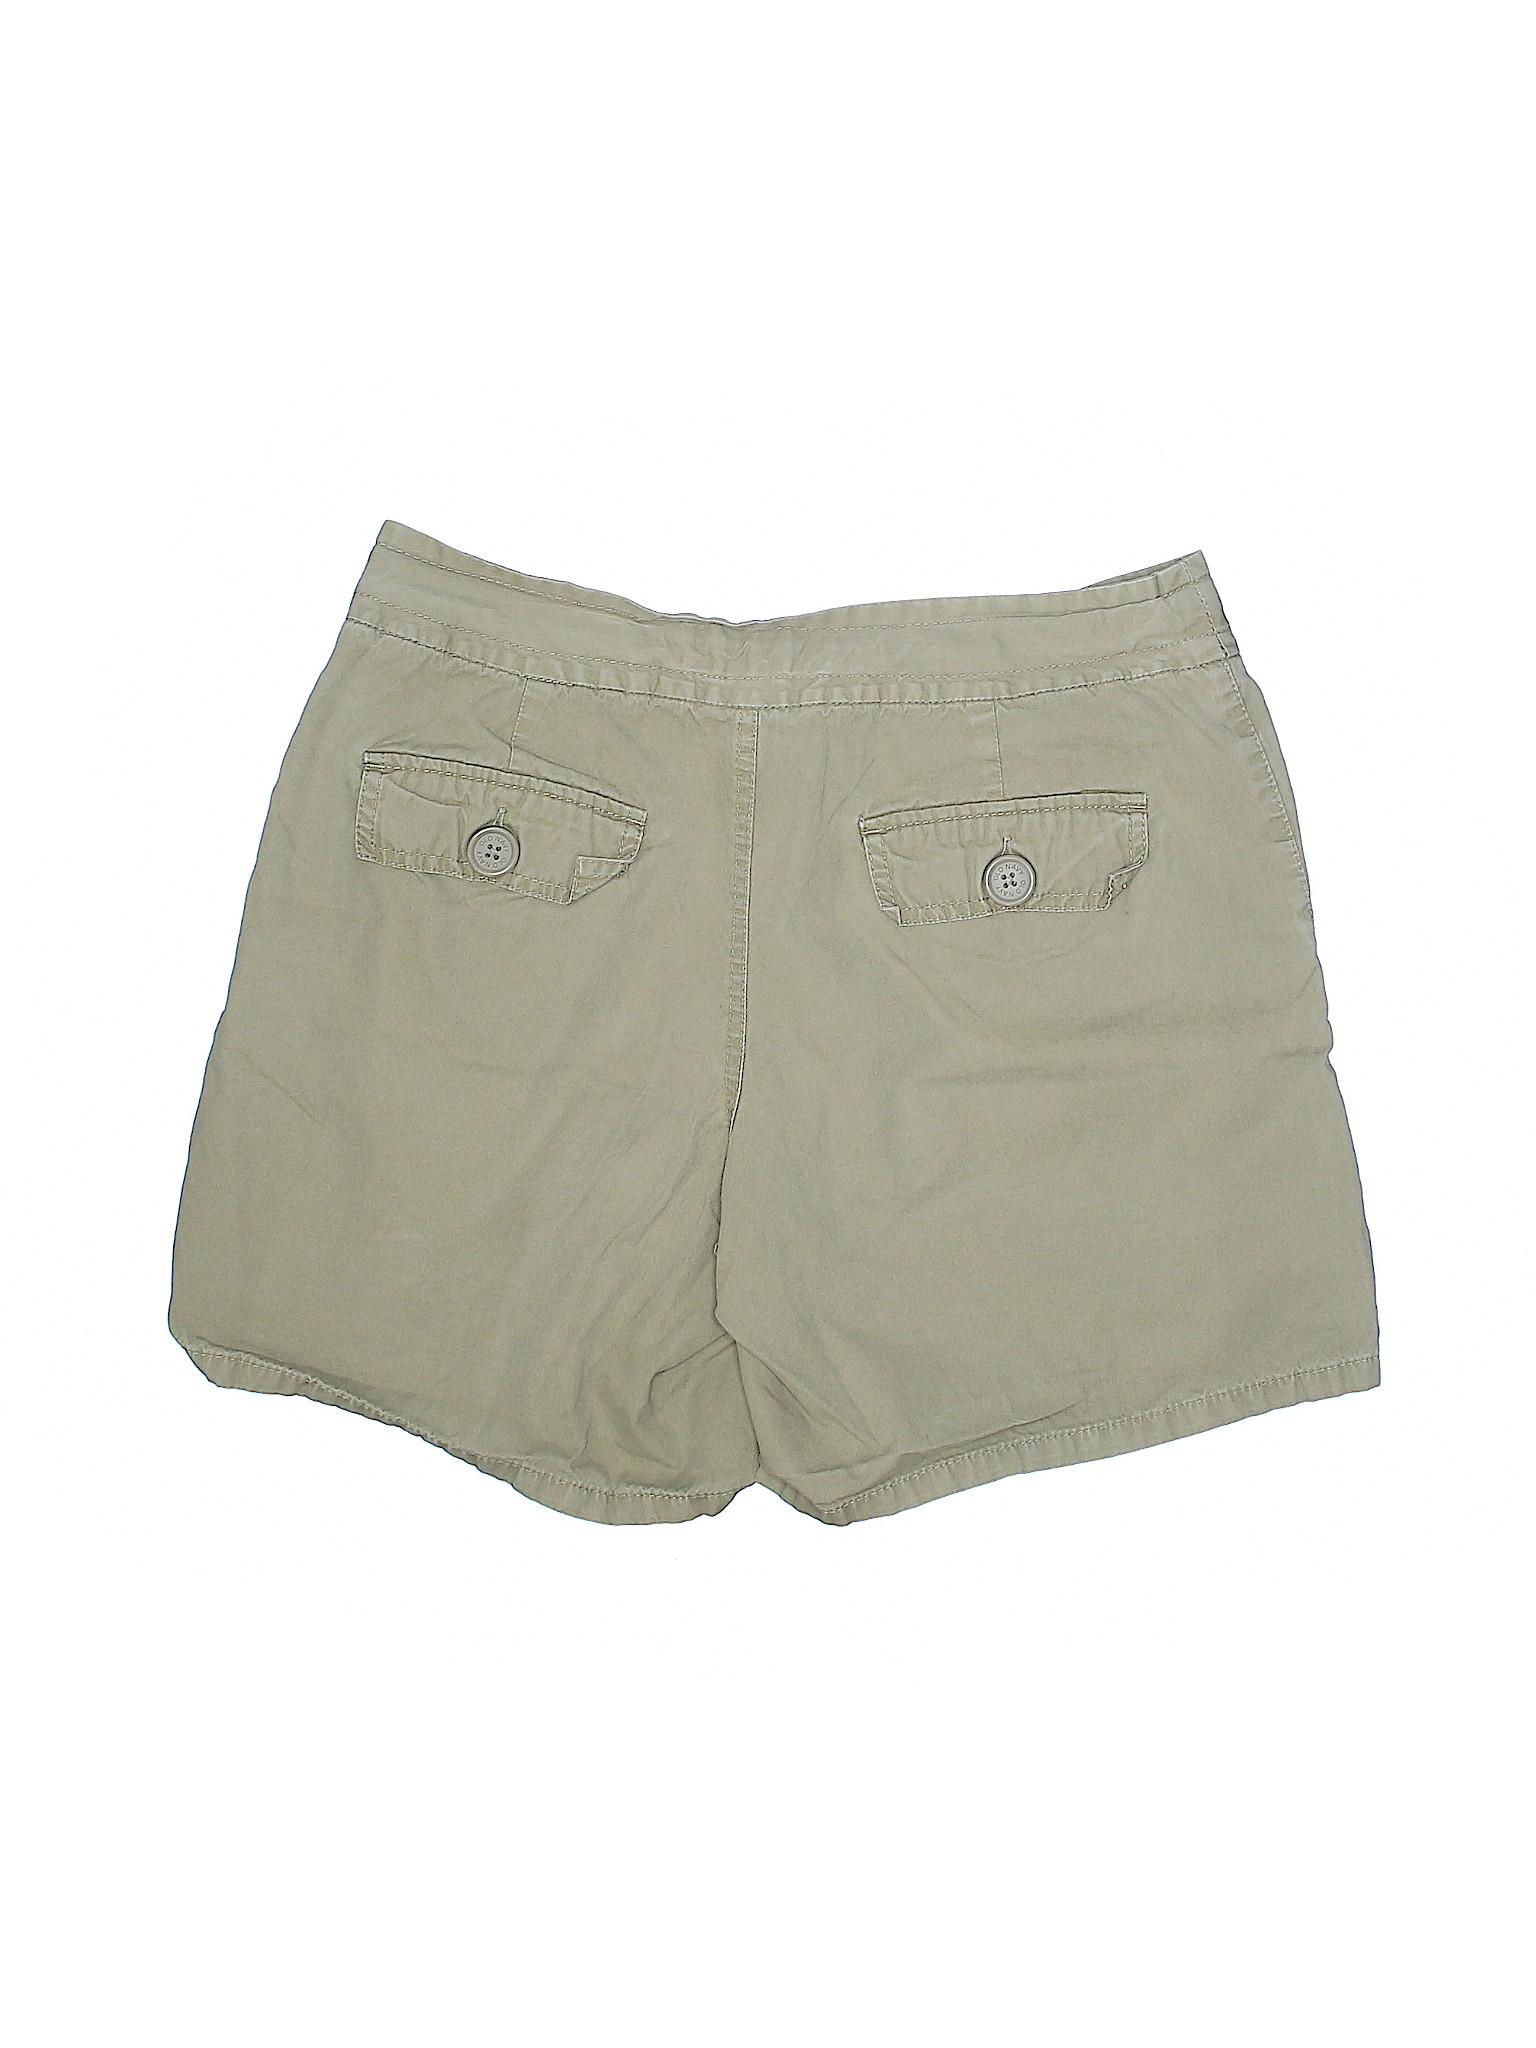 leisure Khaki Old Navy Shorts Boutique POzwFqw